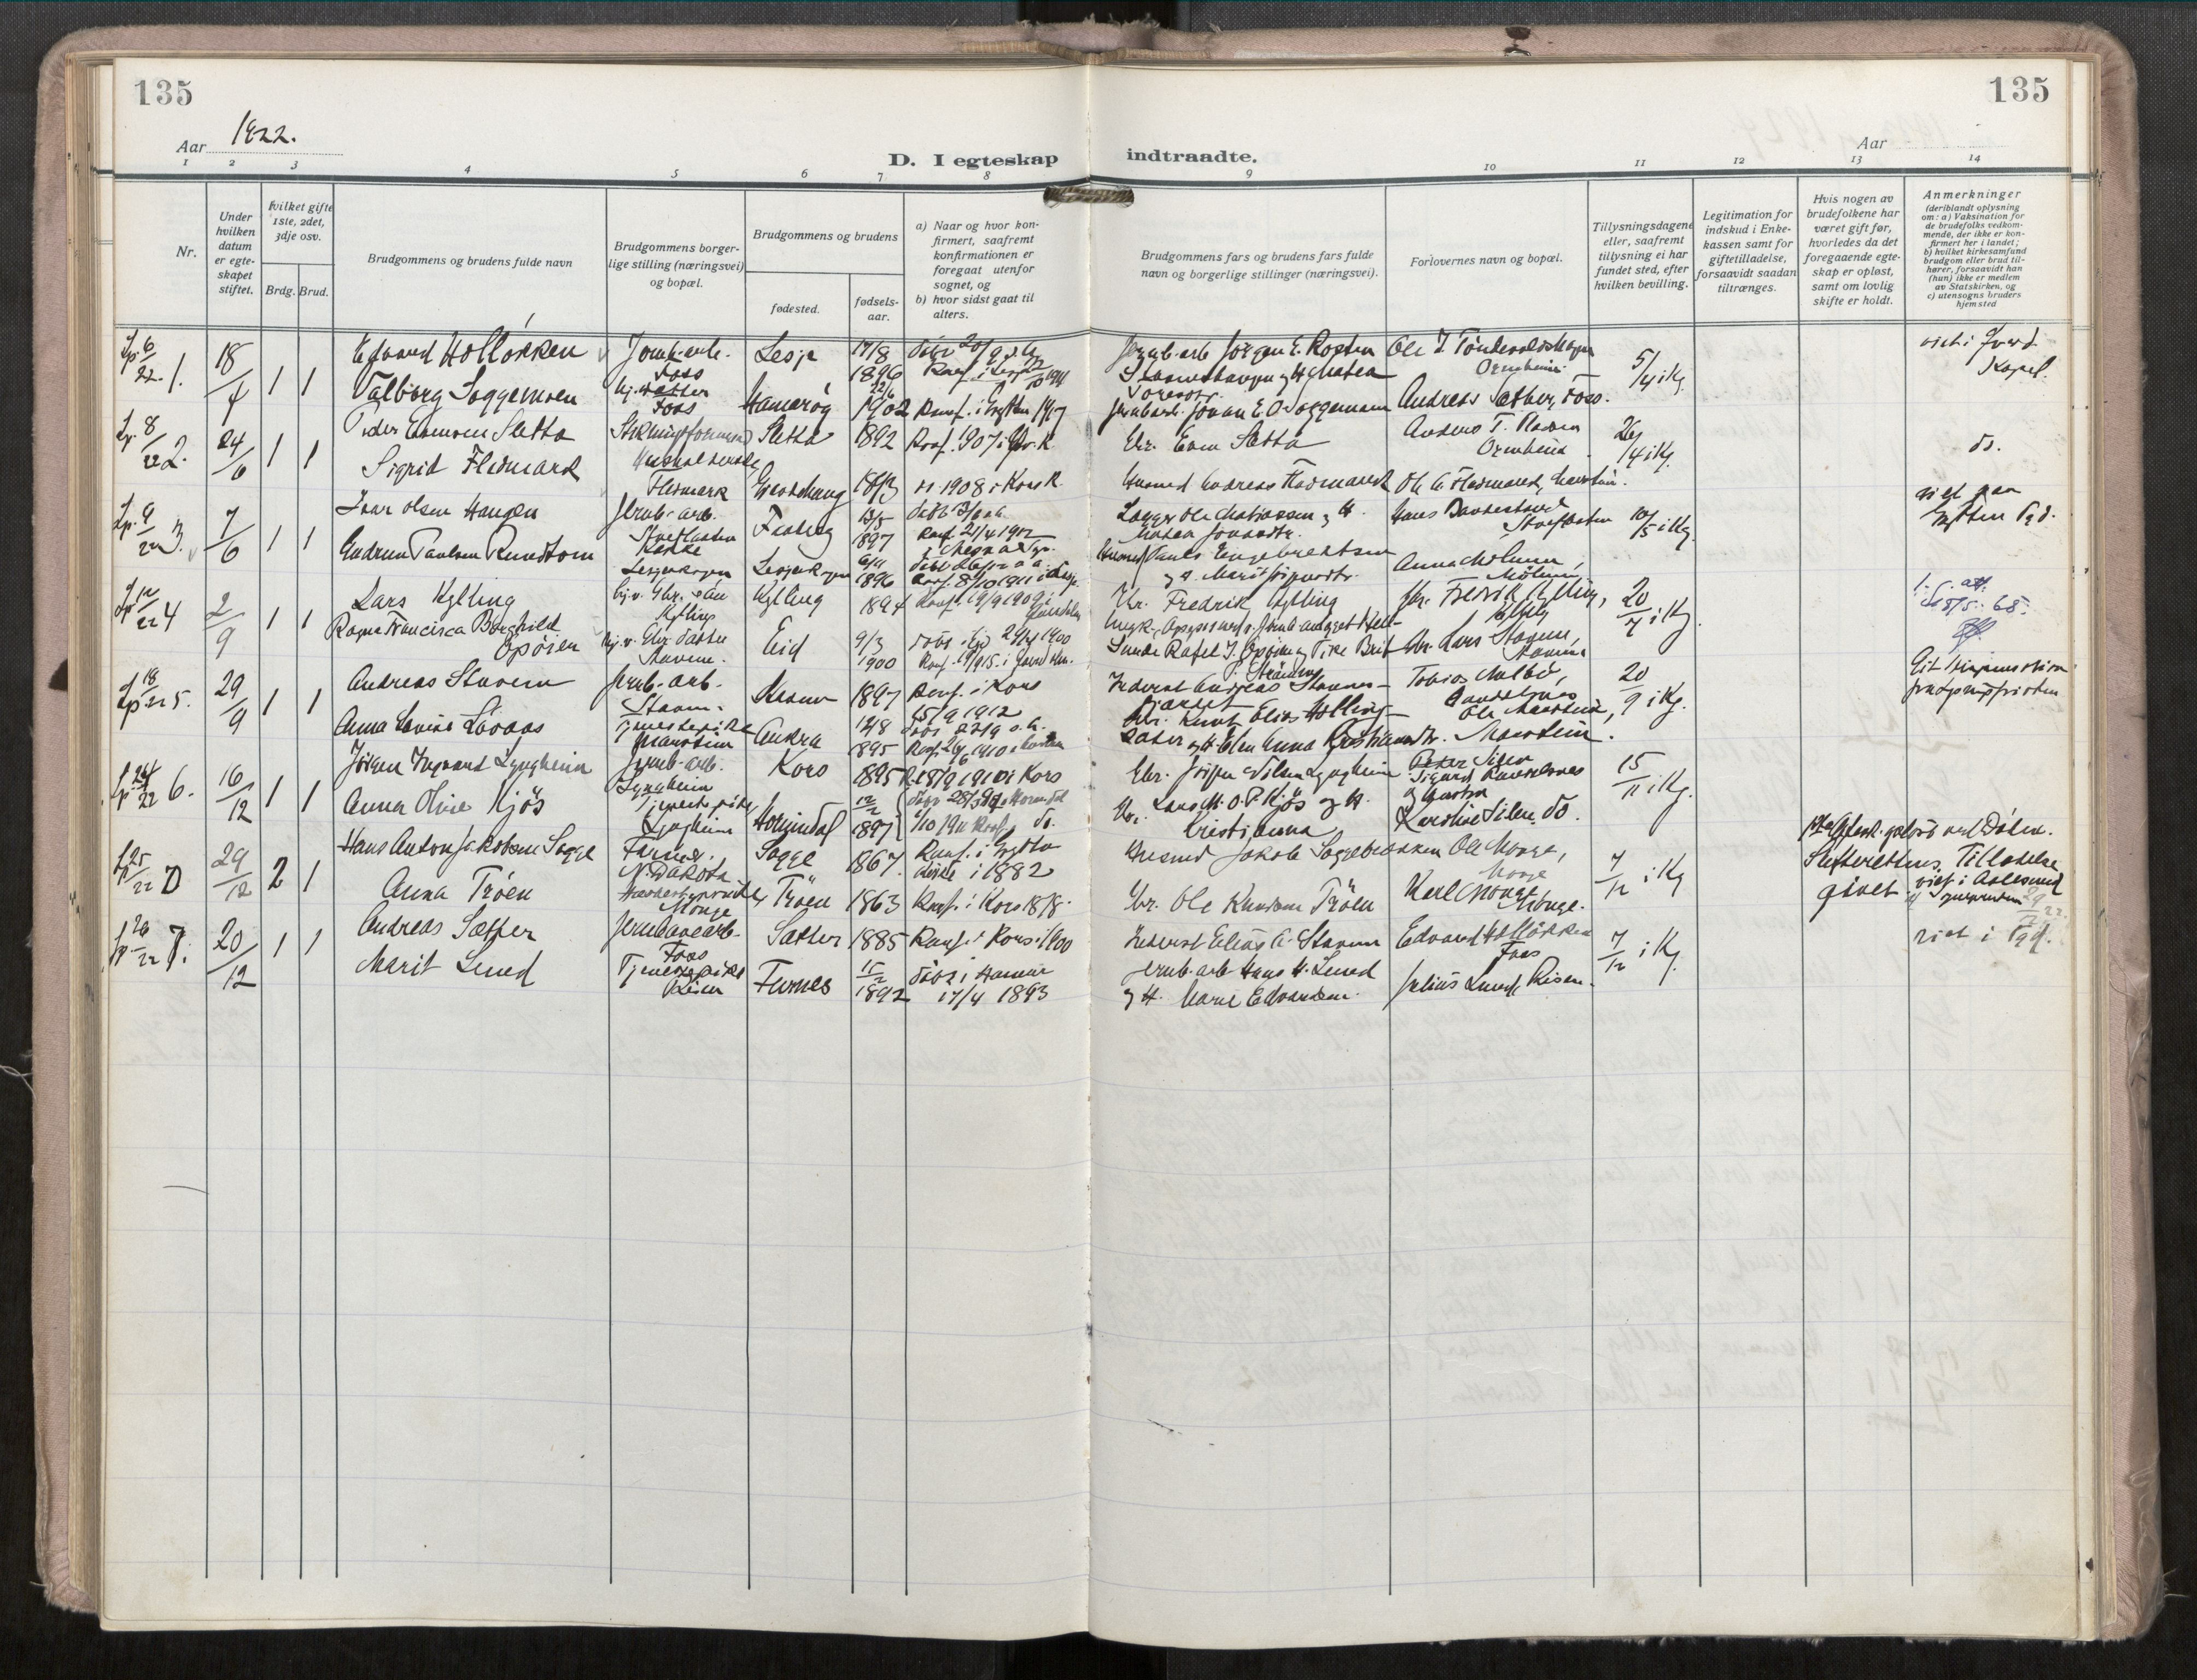 SAT, Grytten sokneprestkontor, Ministerialbok nr. 546A04, 1919-1956, s. 135